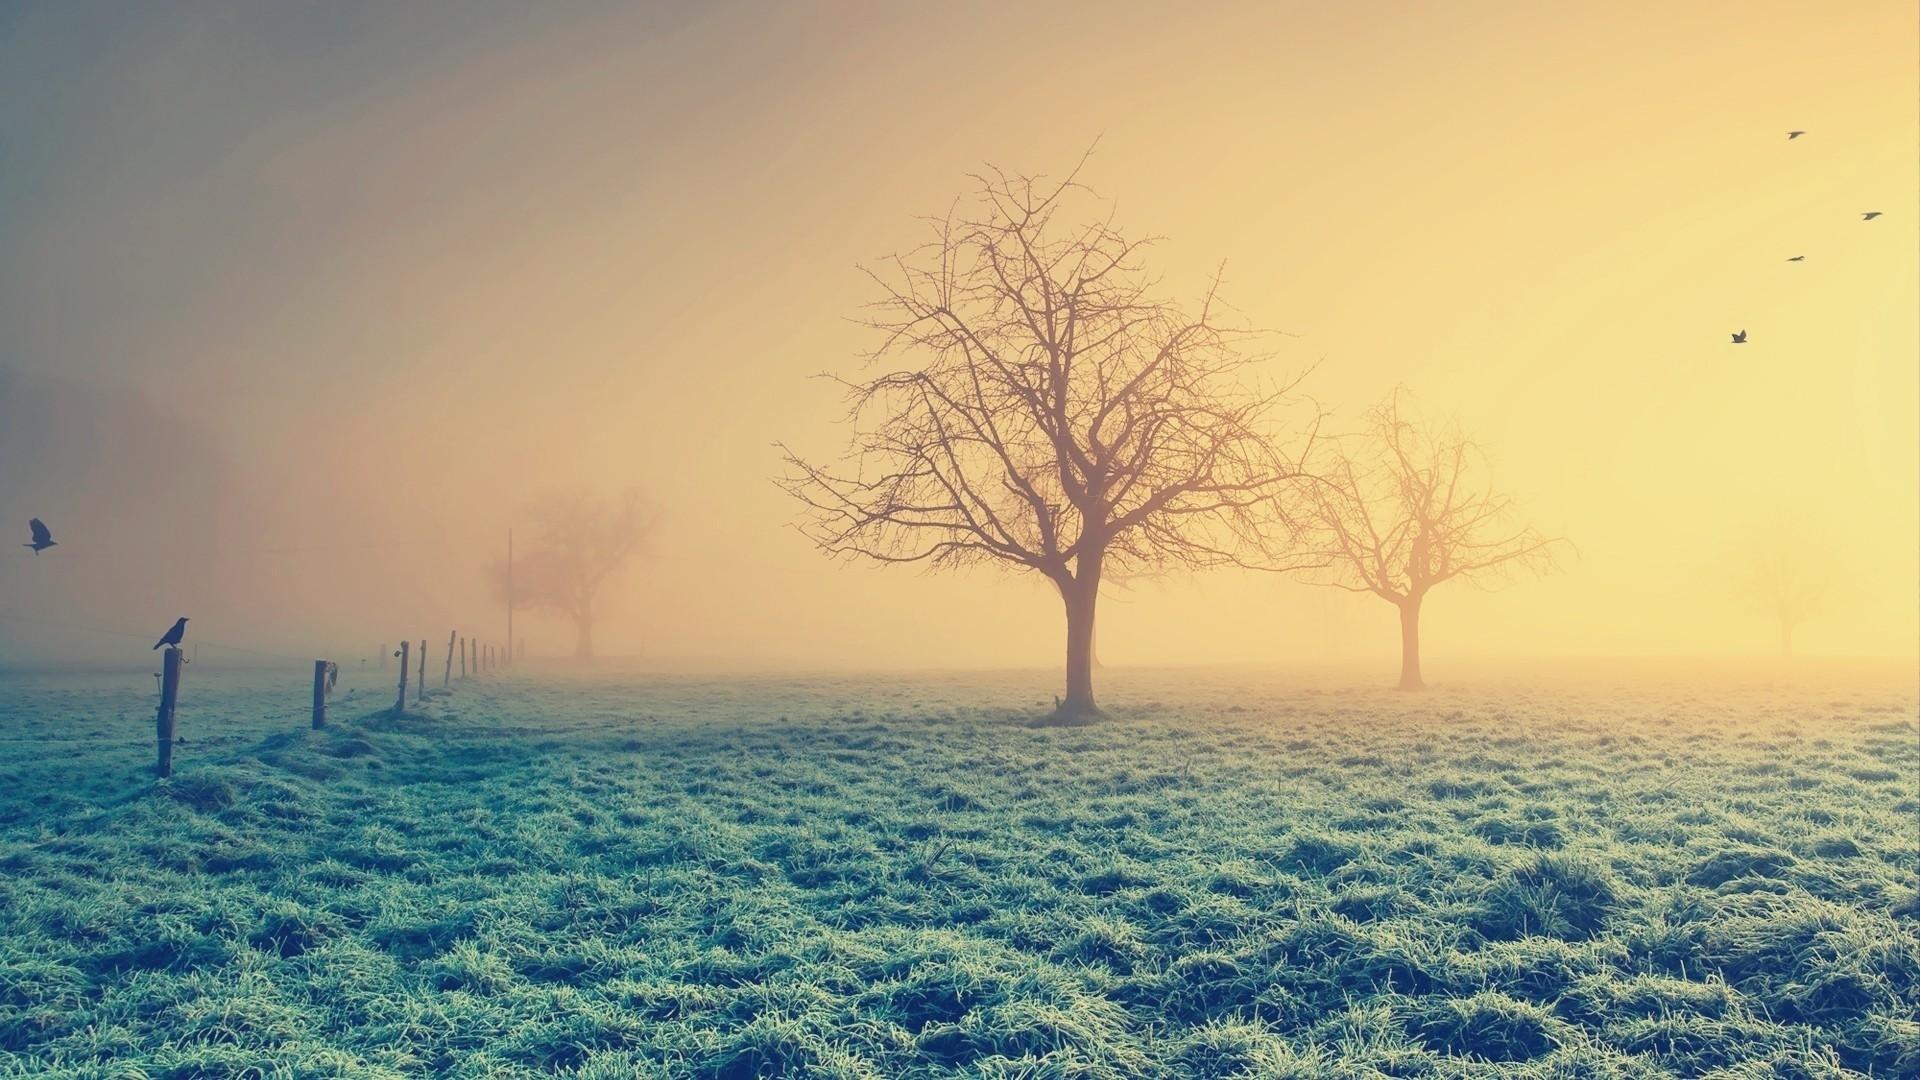 misty fog landscape wallpapers - photo #18